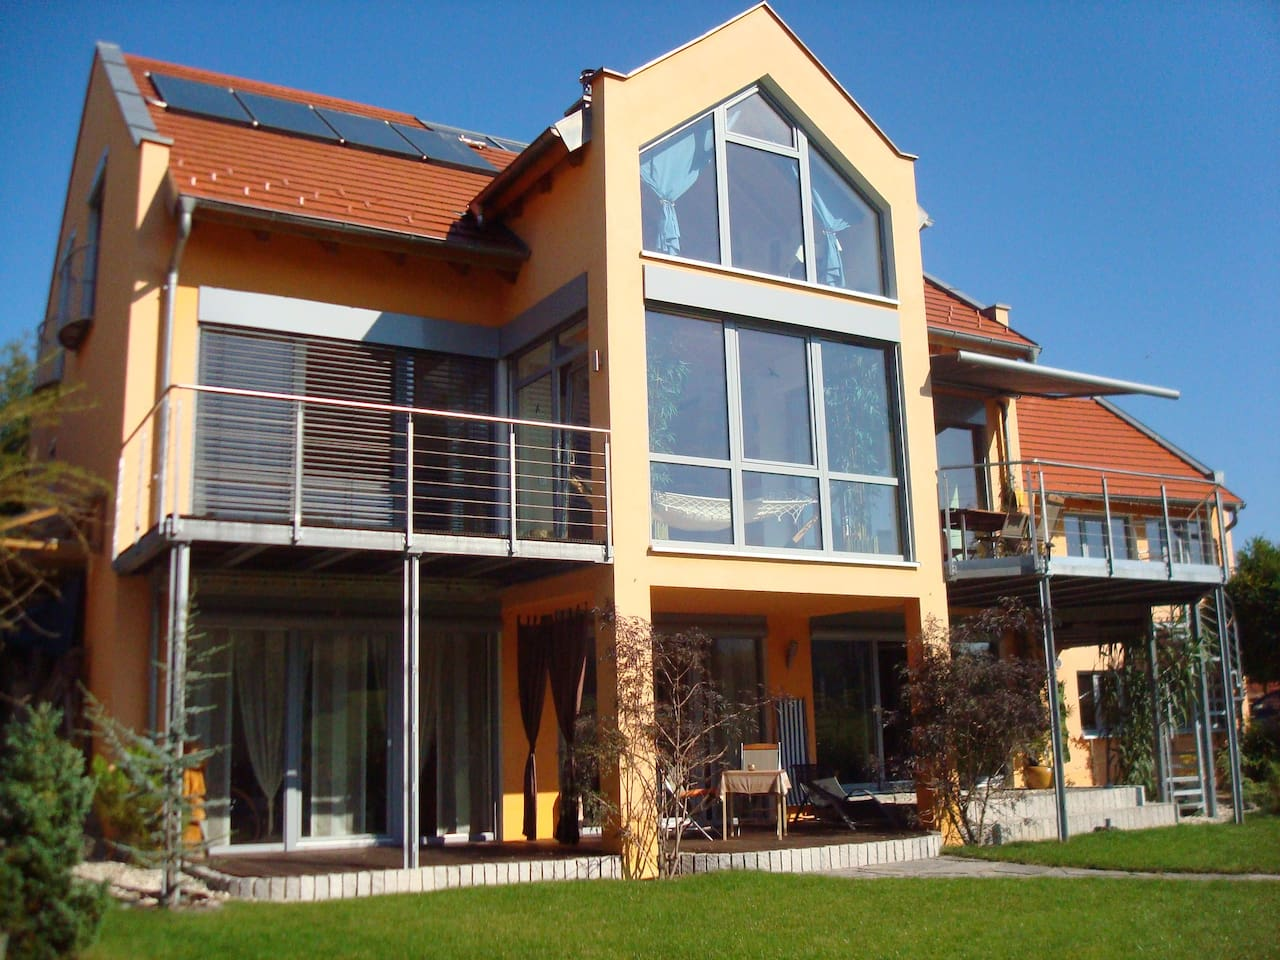 Balkon kinder decor for Katzennetz balkon mit alfamar algarve gardens apartments